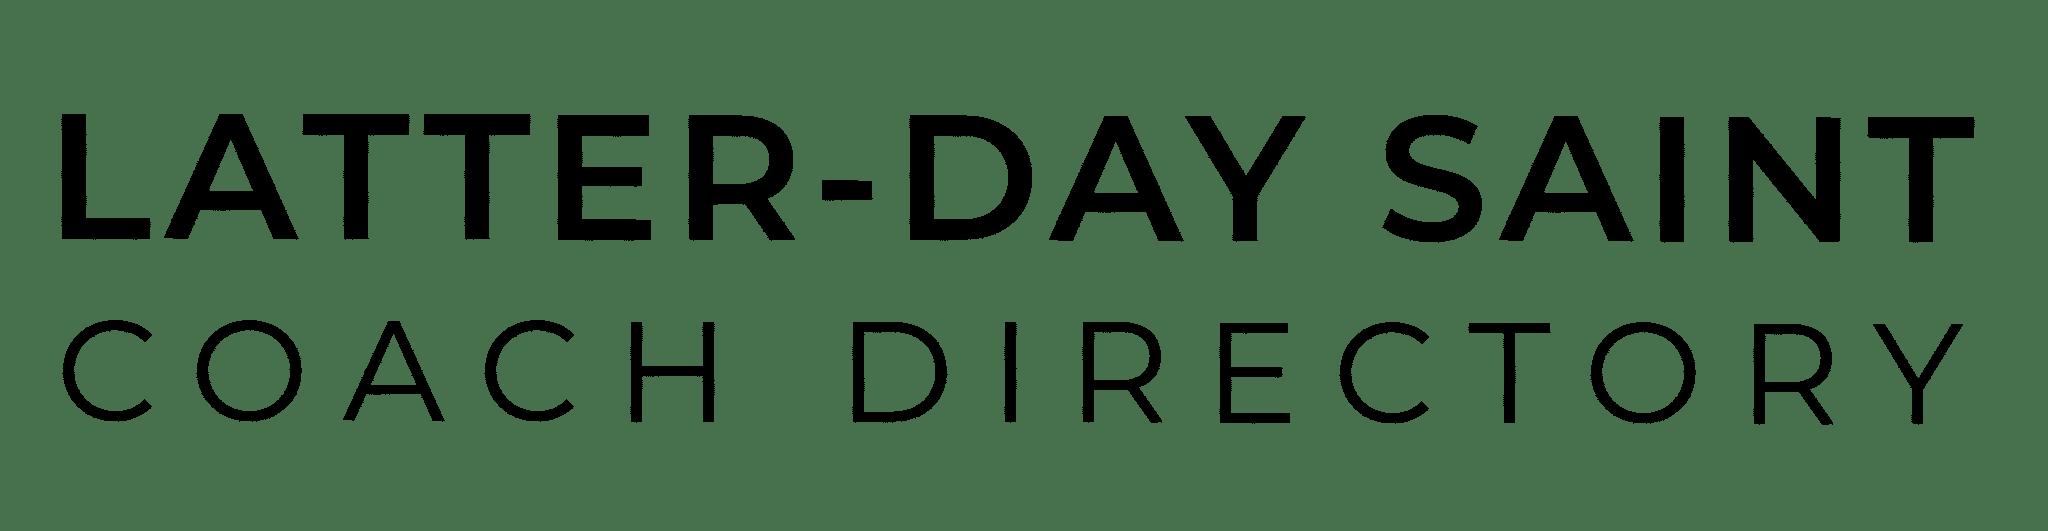 Latter-day Saint Life Coach Directory